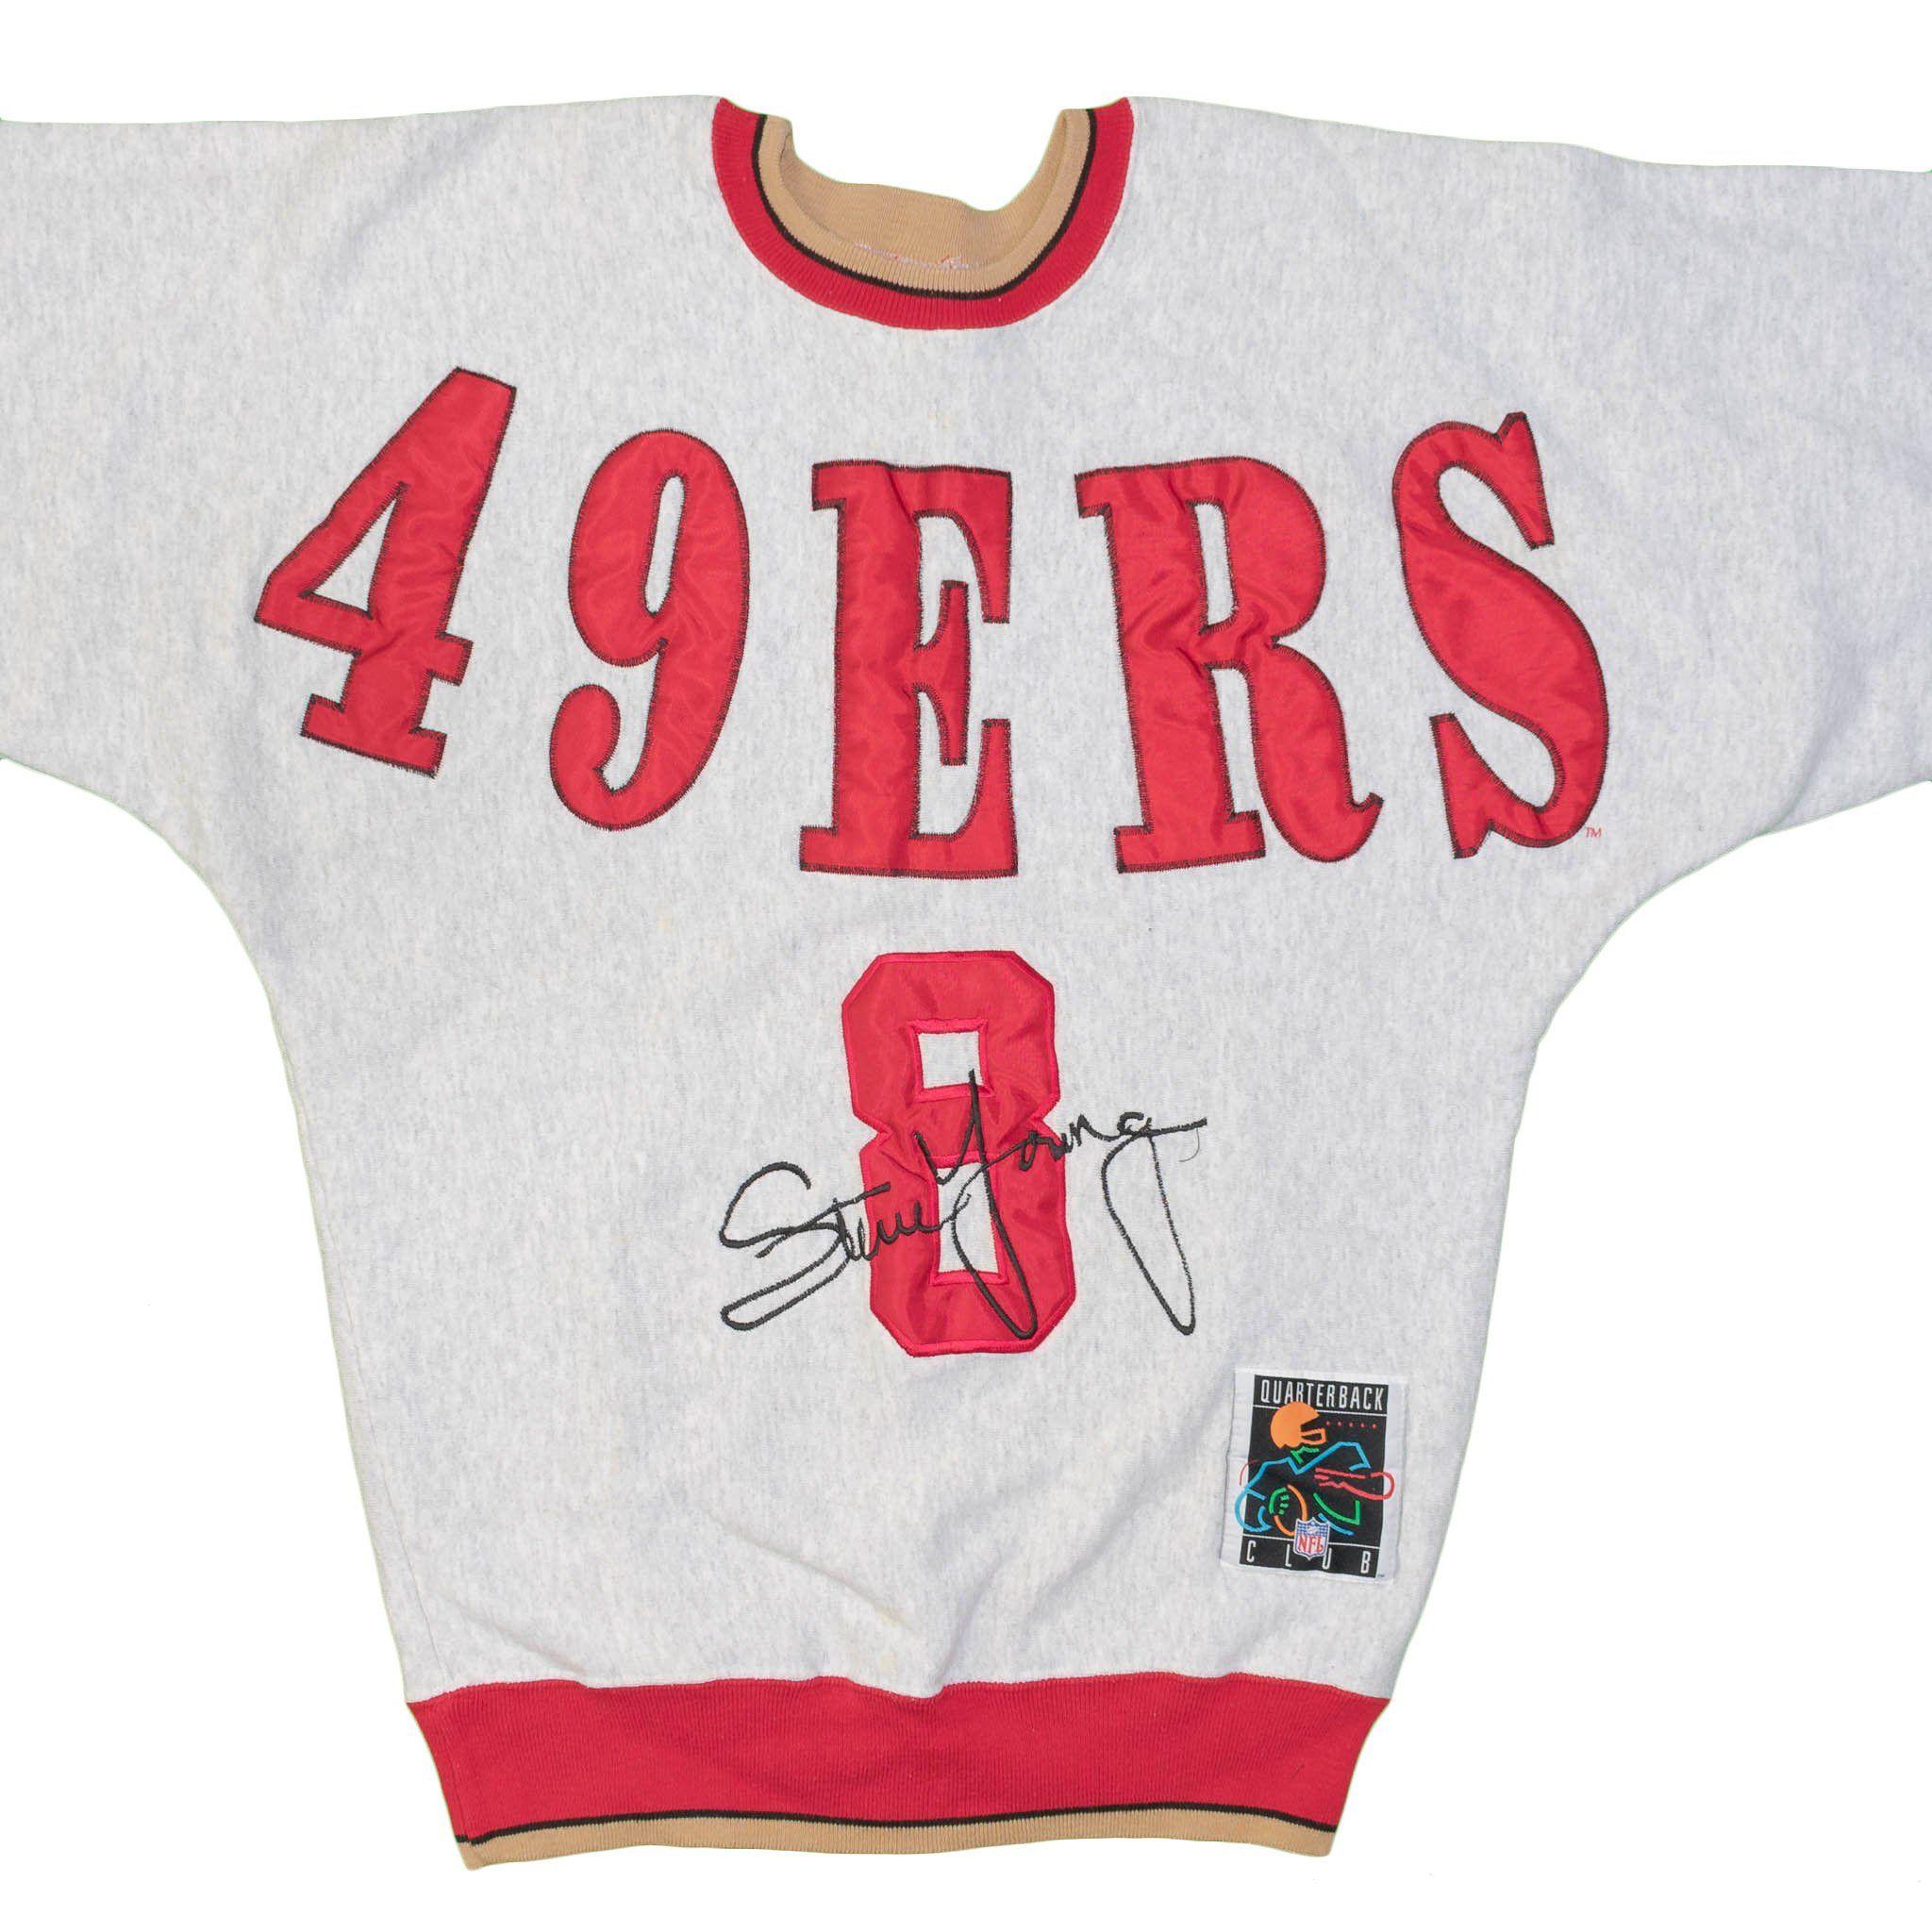 6966f11e San Francisco 49ers Sweatshirt Steve Young #8 Vintage Large NFL ...